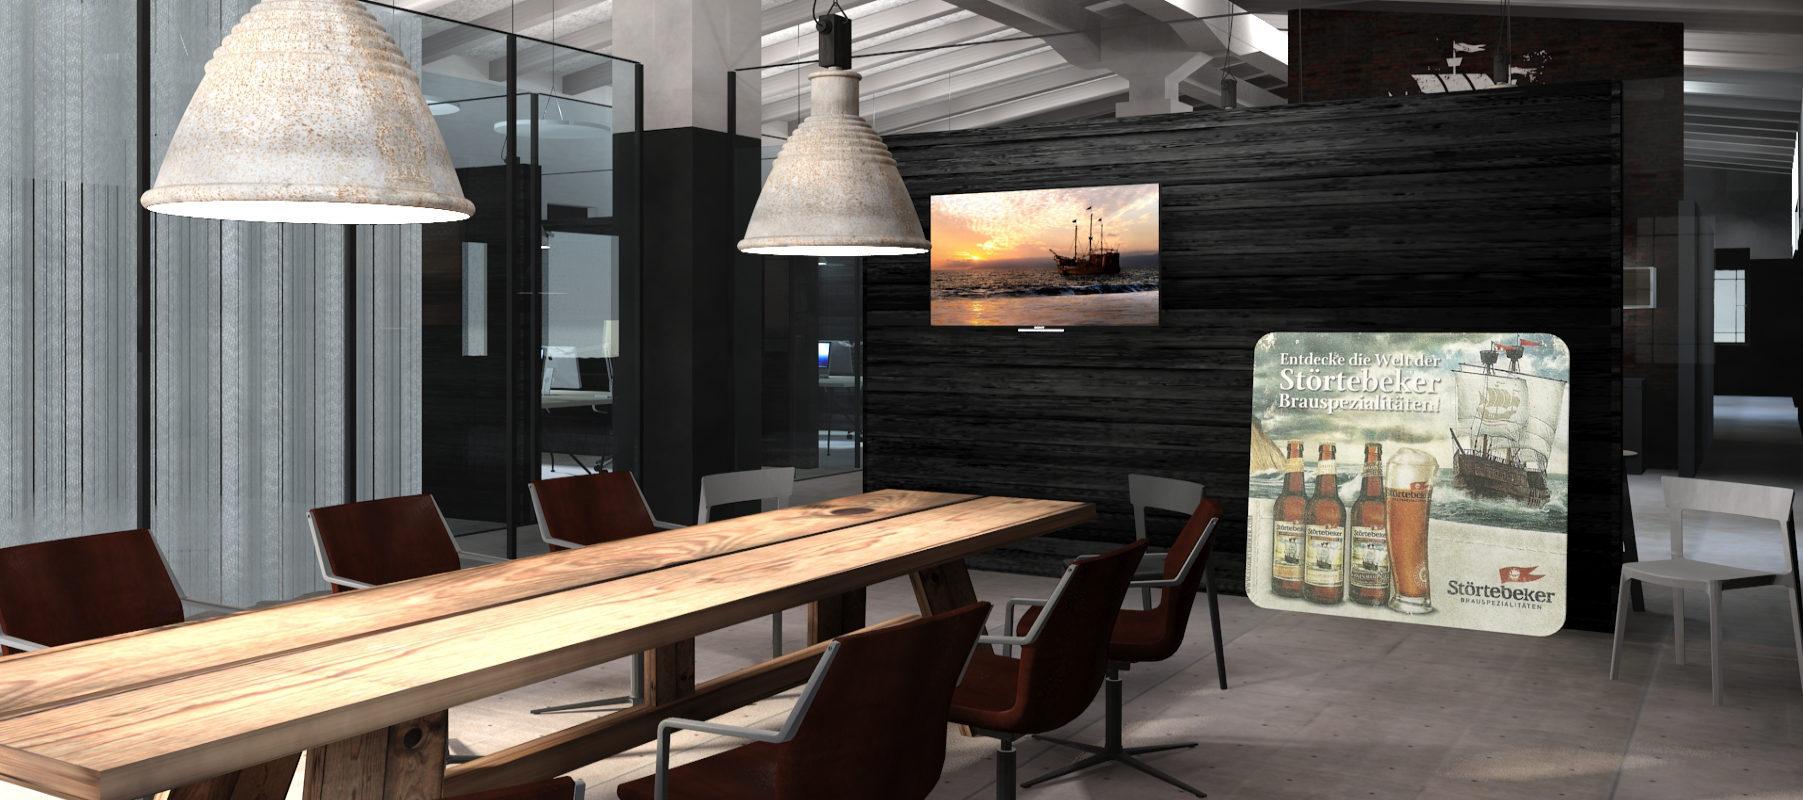 Büro-Design Konferenzraum Besprechungstisch